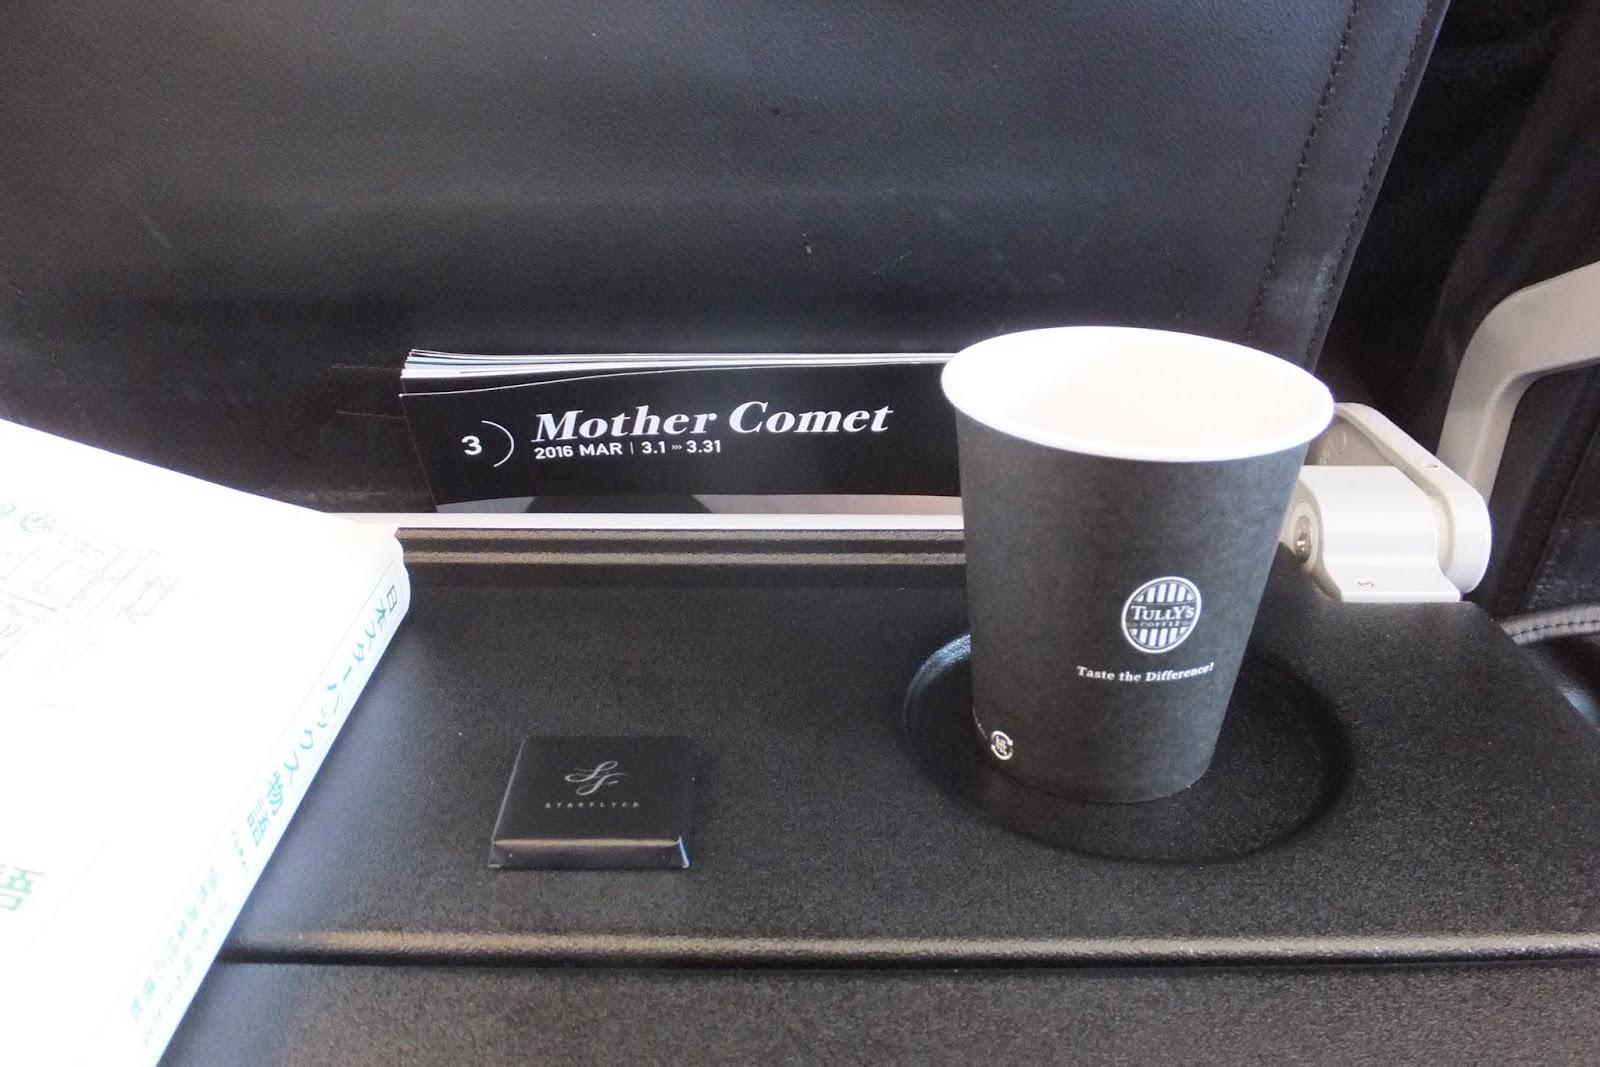 starflyer-tully's-coffee